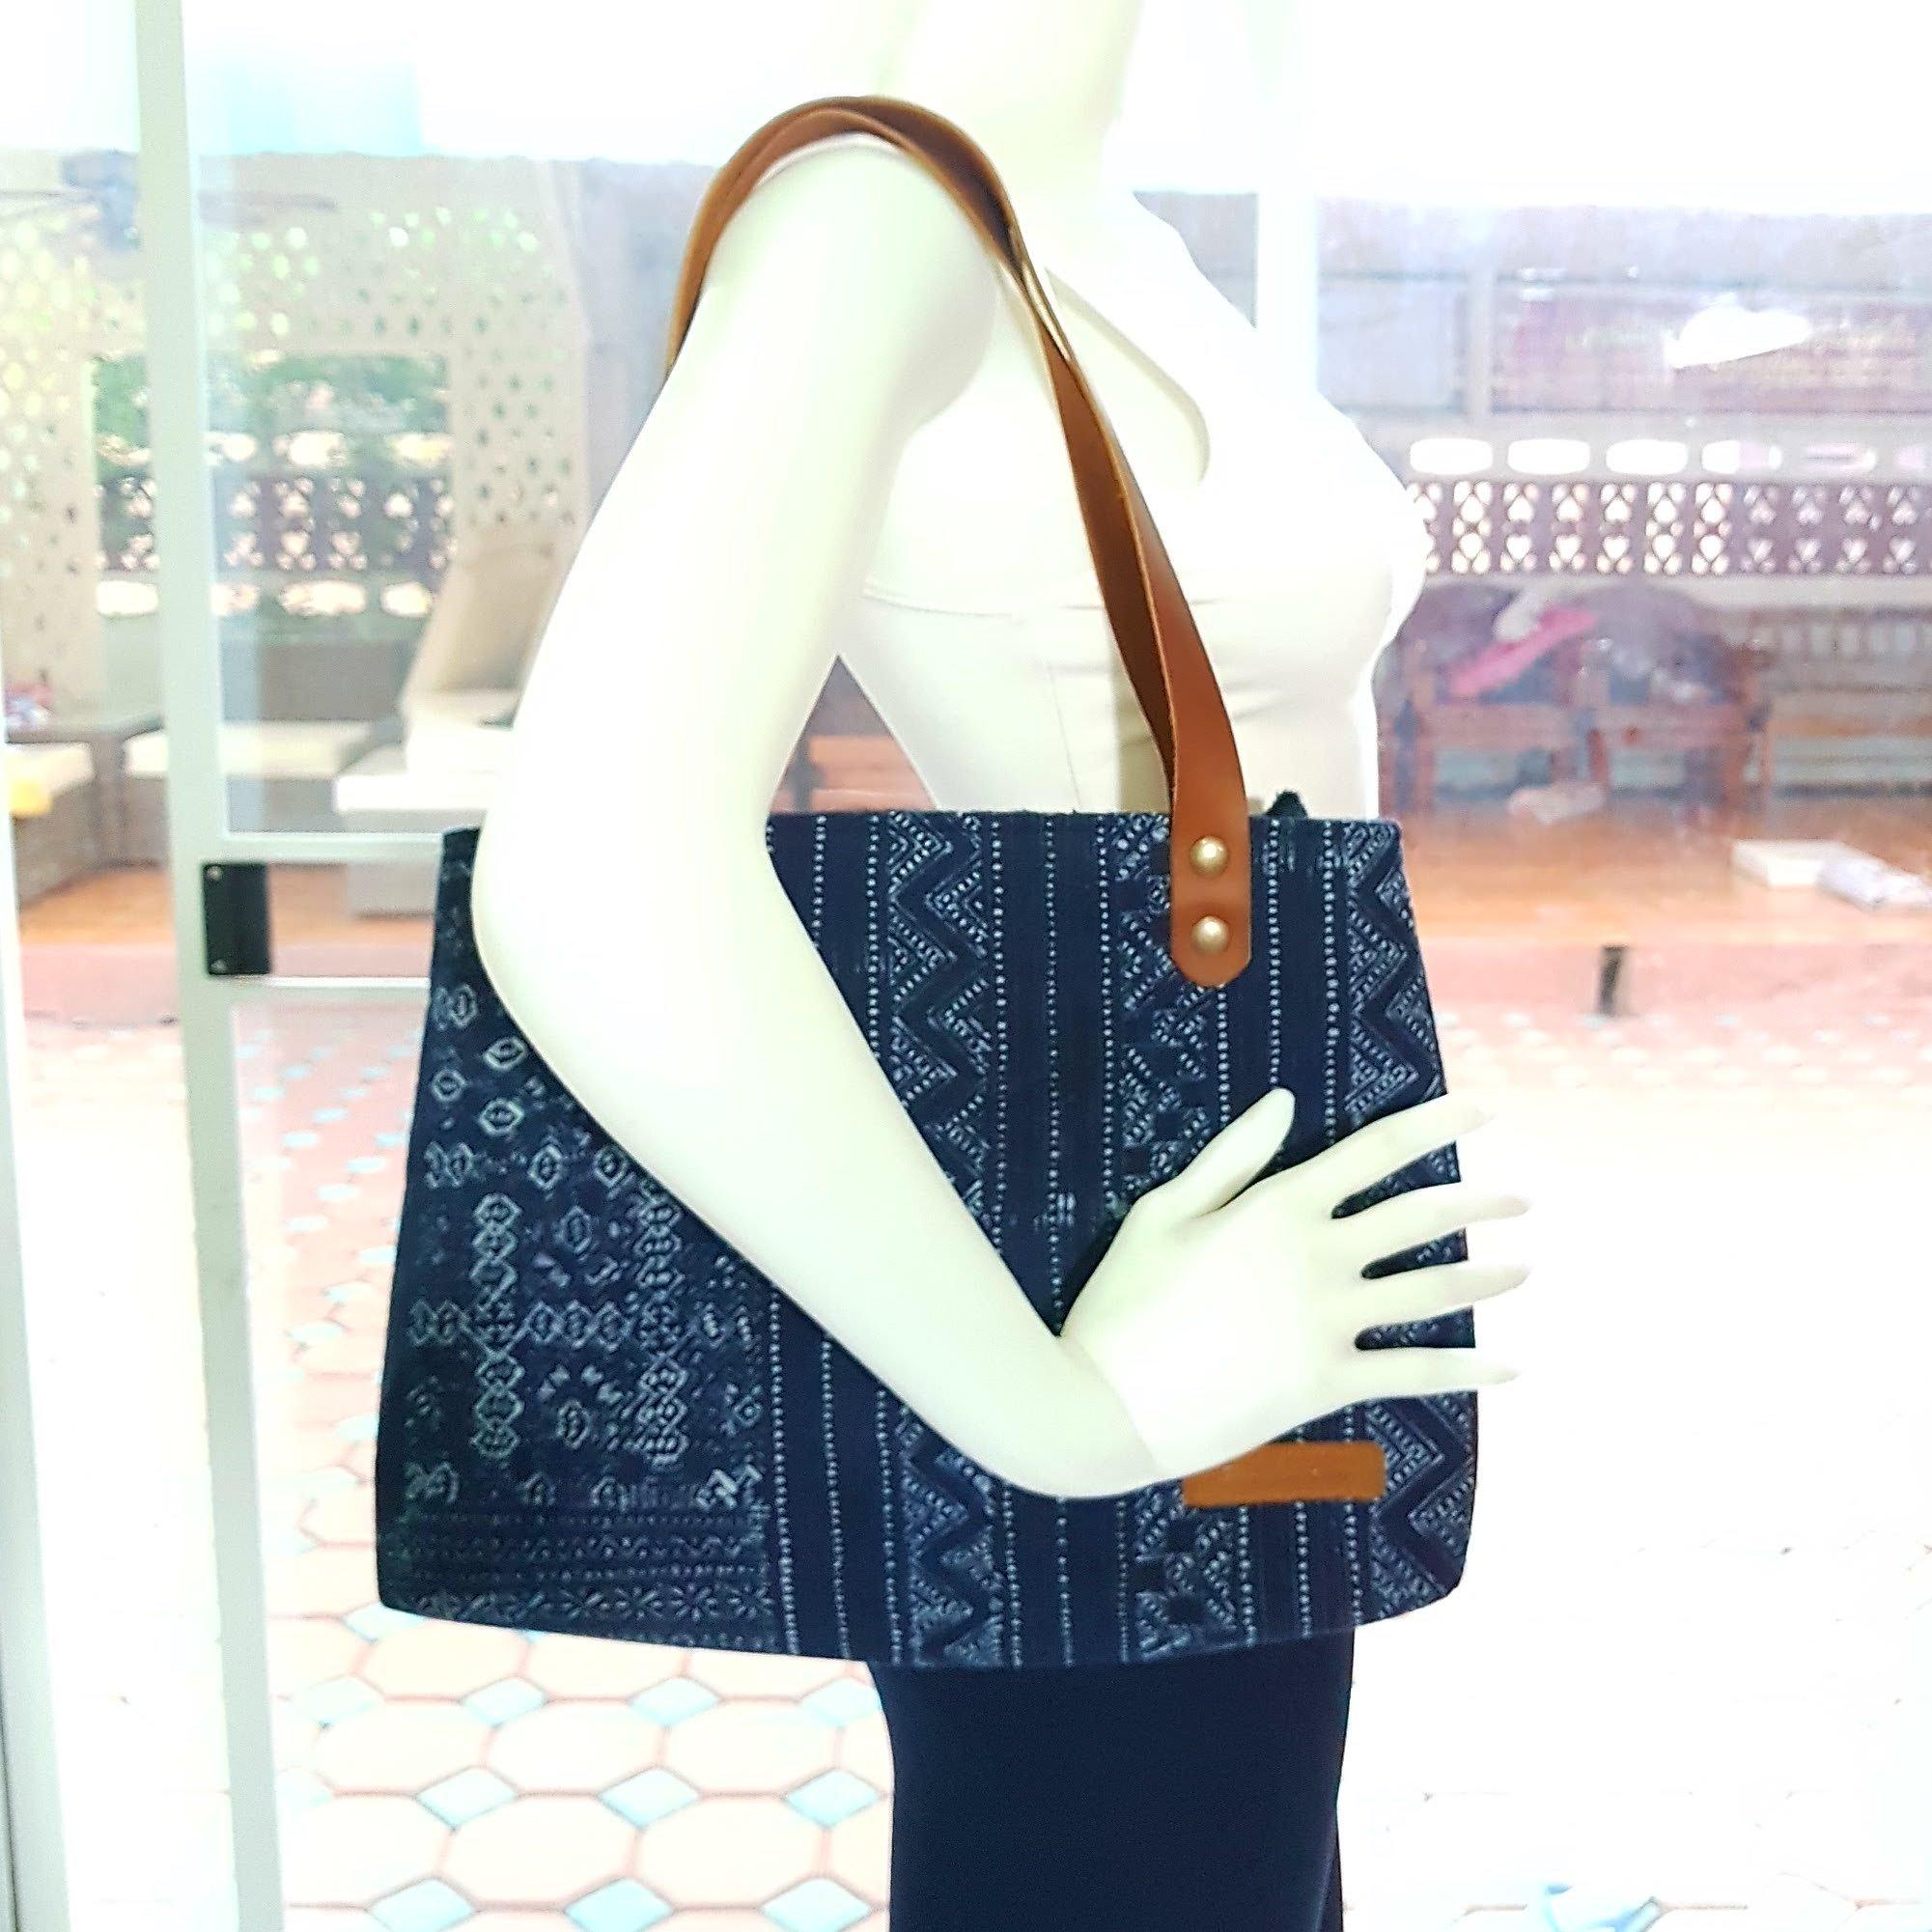 Bohemian / Handbags / Purses / Tote bags / Anniversary Gifts / Christmas Gift Ideas / Blue / Indigo